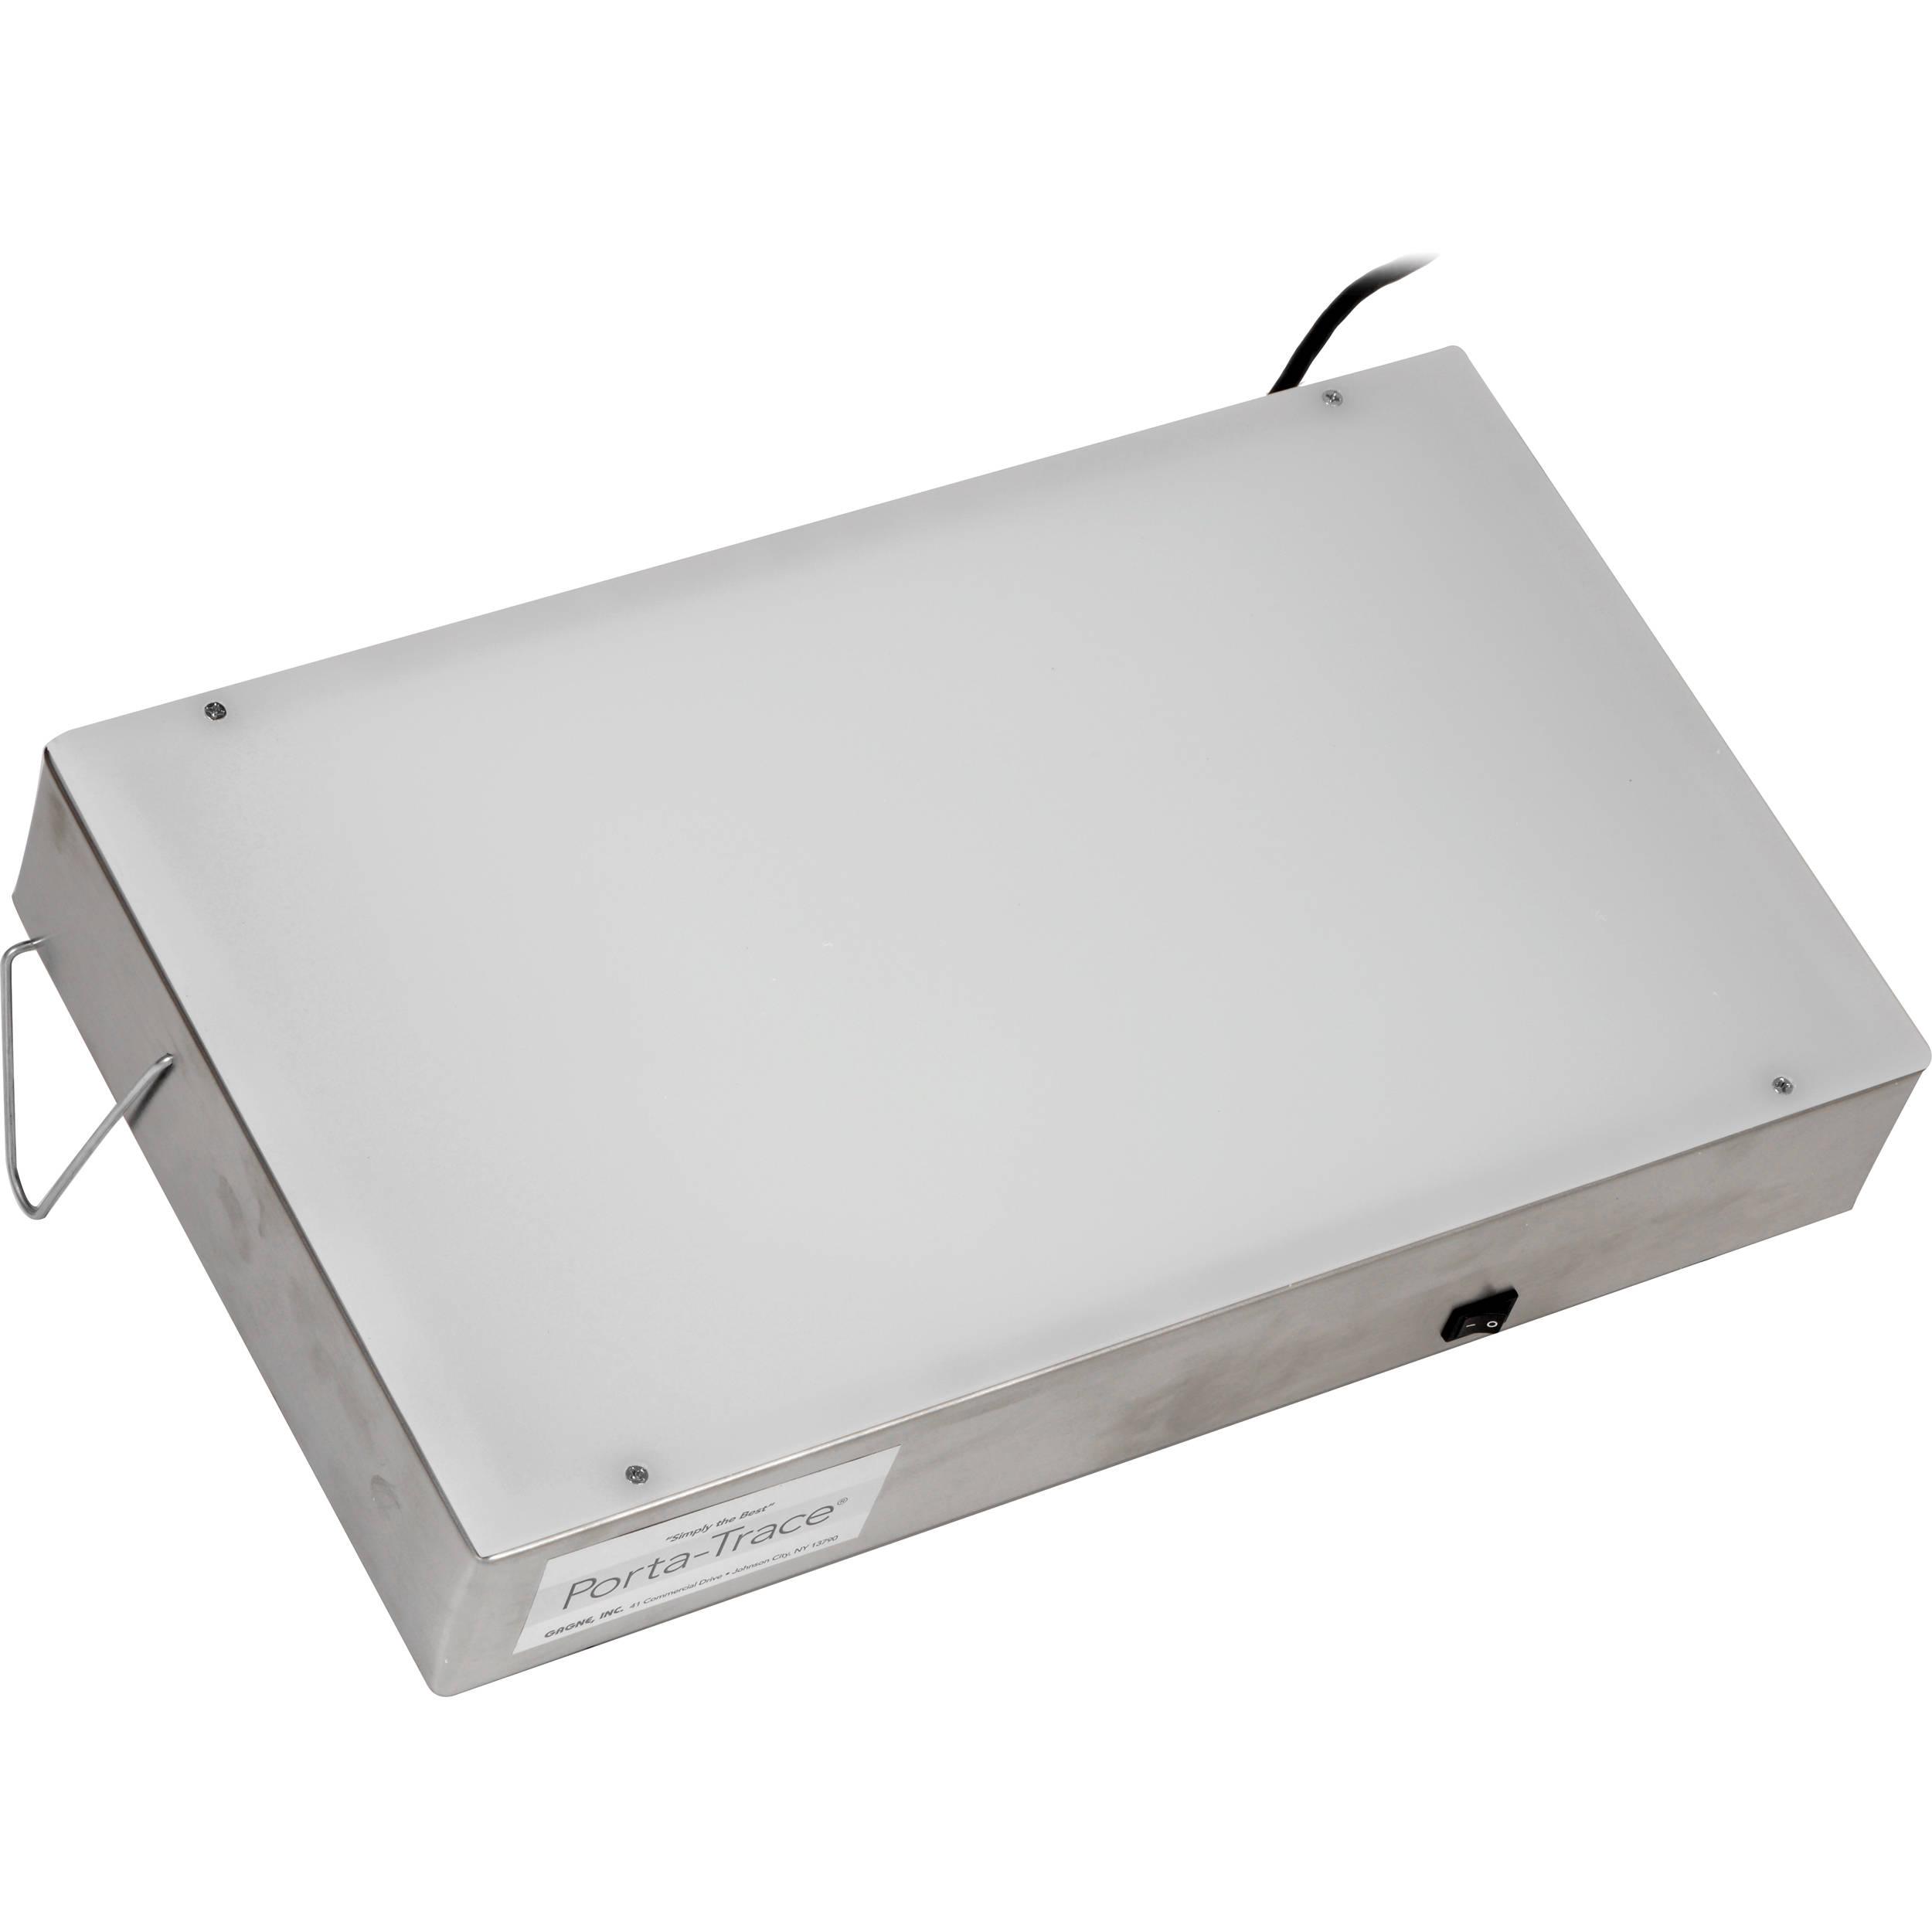 porta trace gagne 1118 1 stainless steel led light box. Black Bedroom Furniture Sets. Home Design Ideas